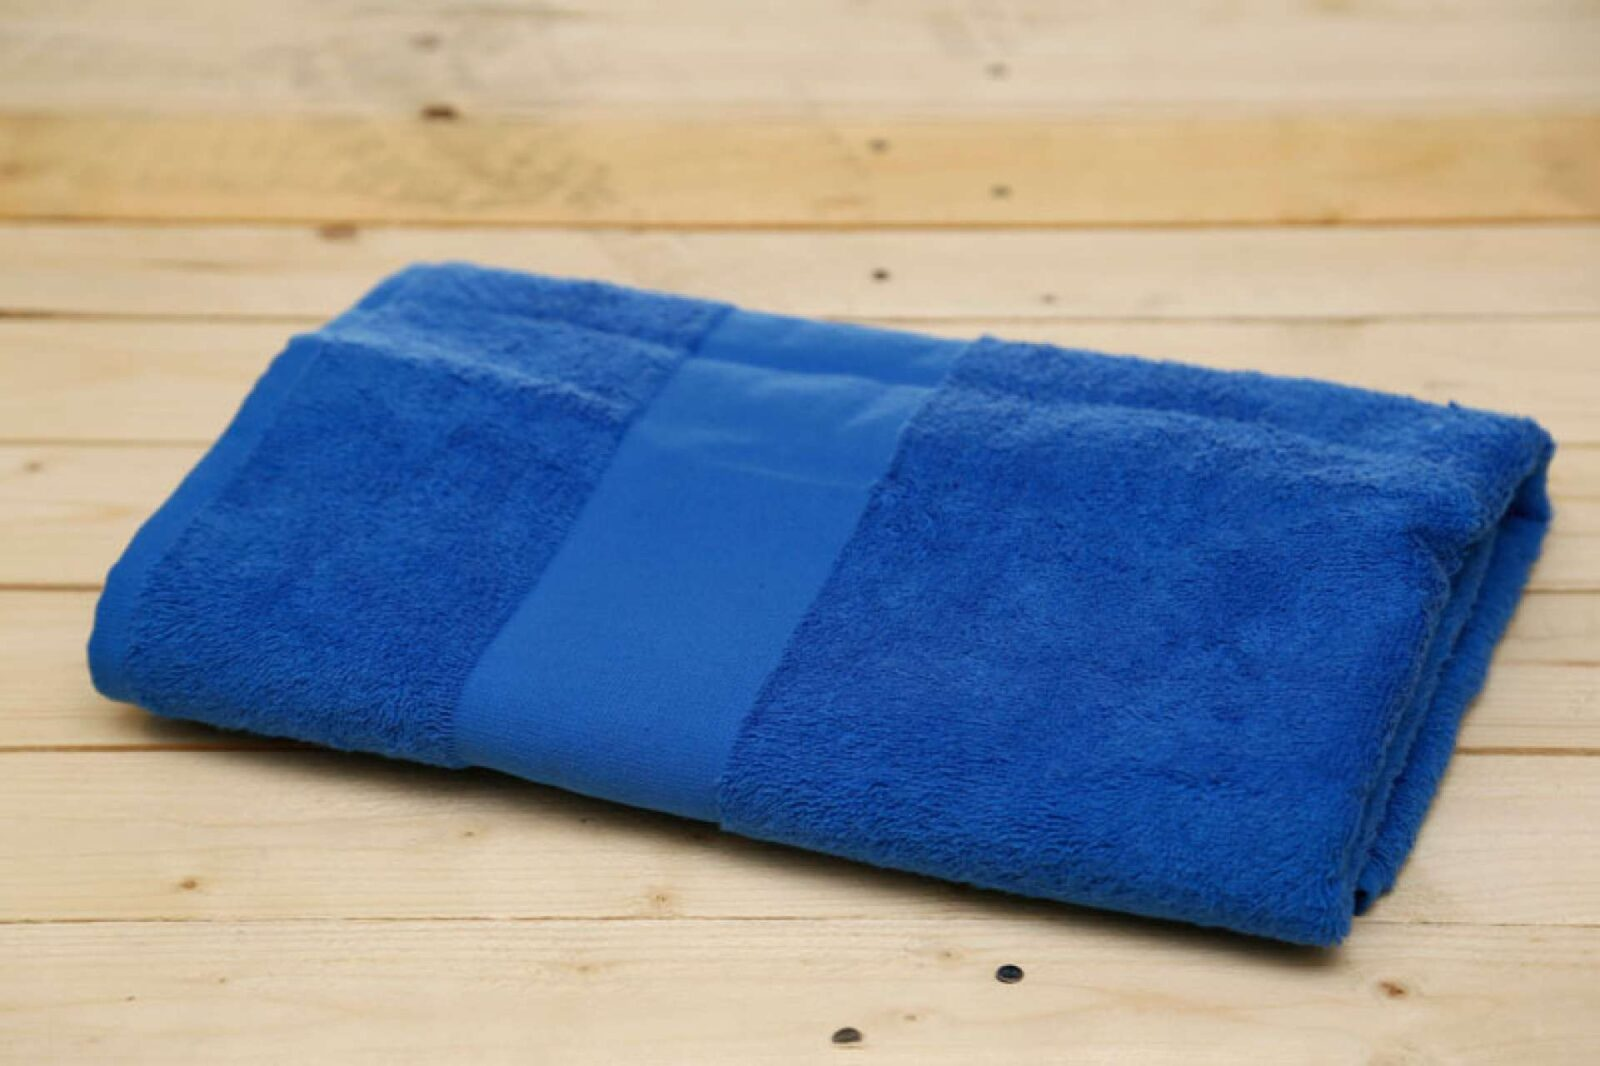 Prosop OL360 albastru royal Prosoape bumbac plaja baie bucatarie absorbante groase personalizate spa hotel broderie diverse dimensiuni